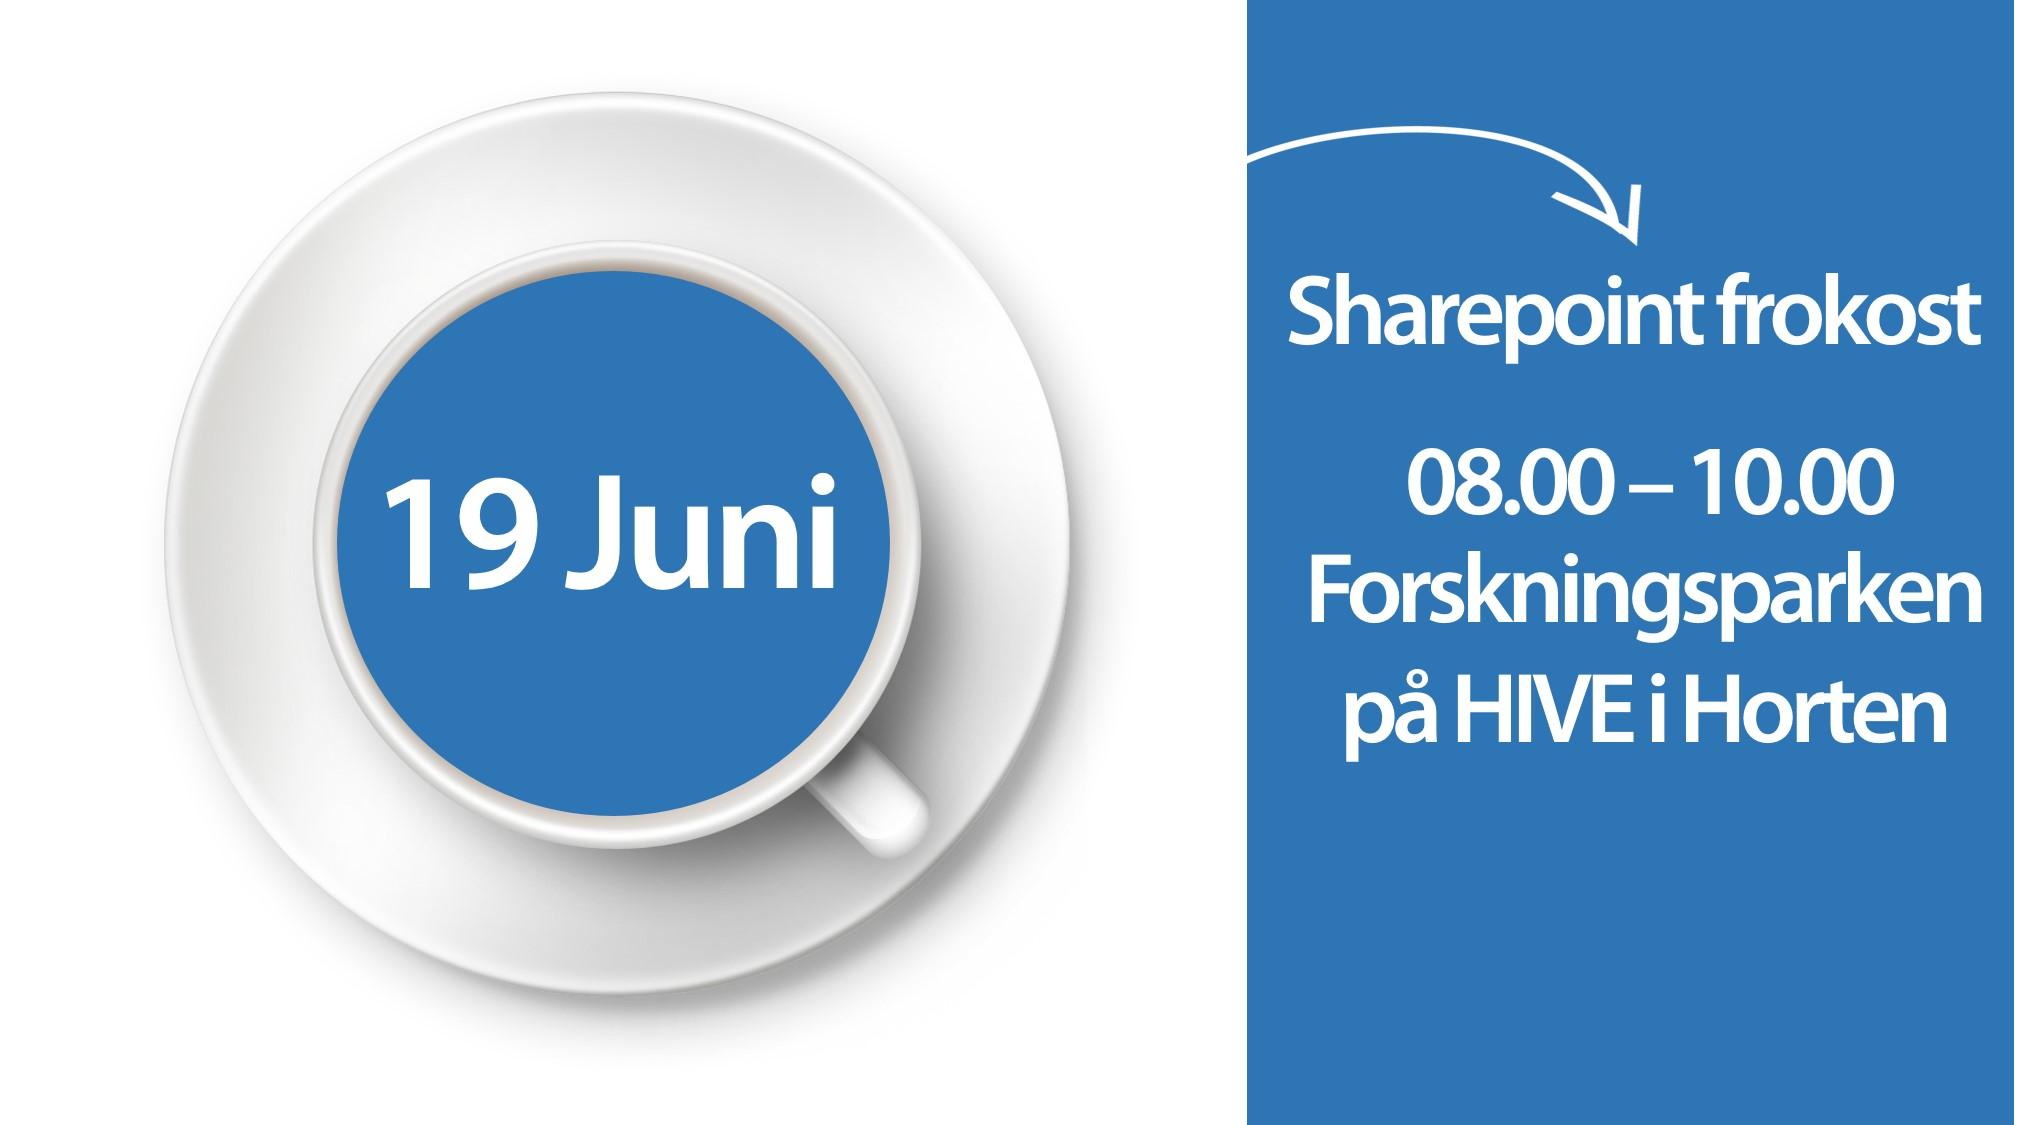 GRATIS Sharepoint frokost 19.juni